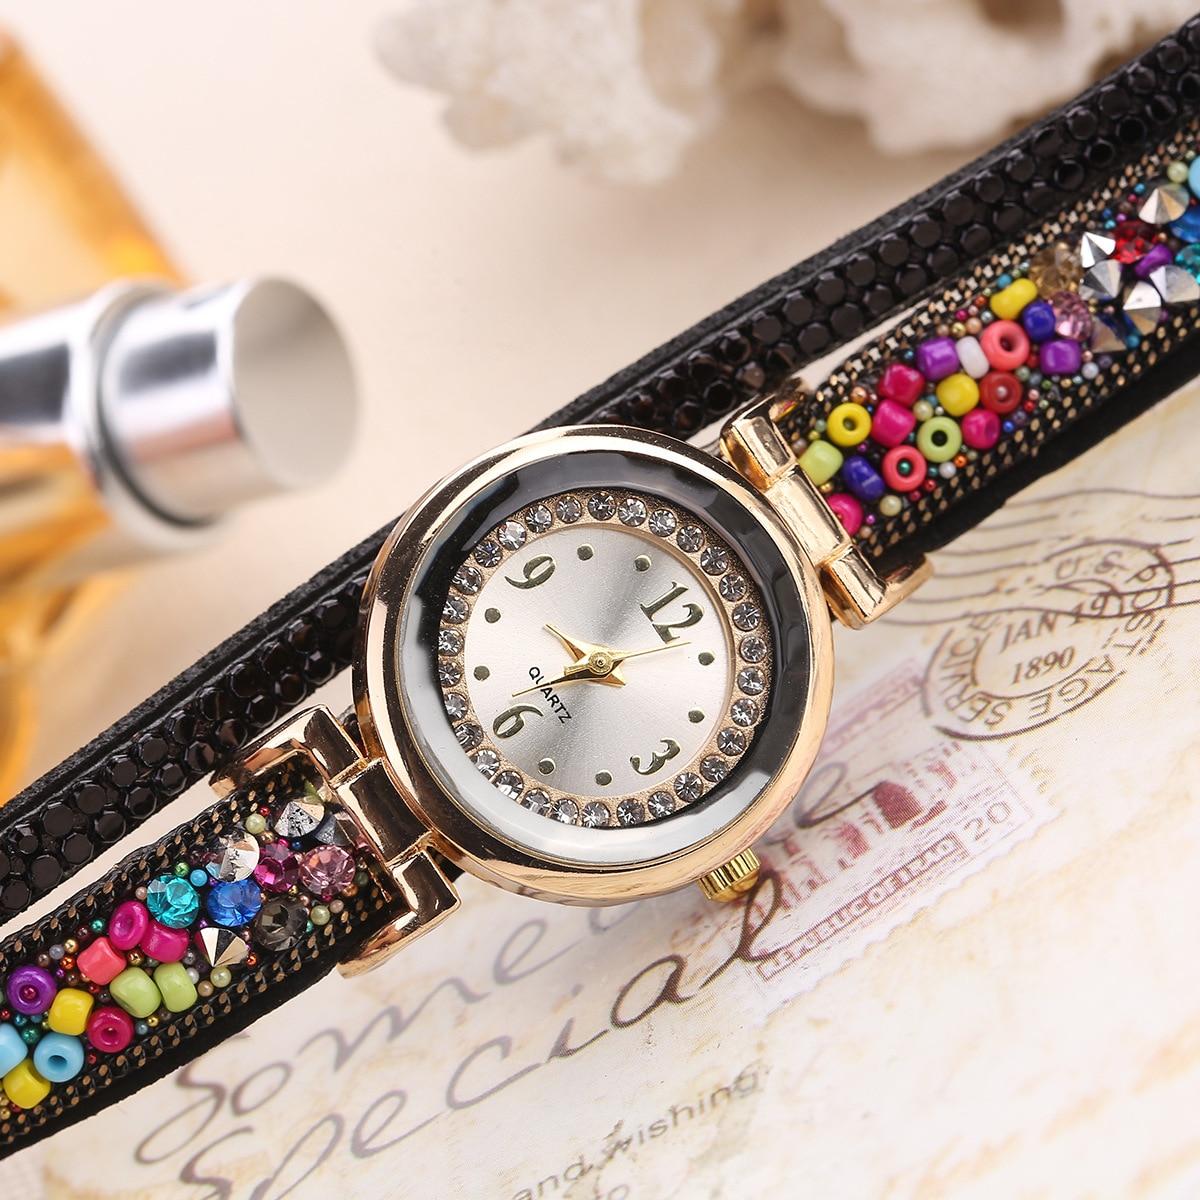 Fashion Luxury Leather Watch Kvinnor Classic Crystal Decor Armband - Damklockor - Foto 6